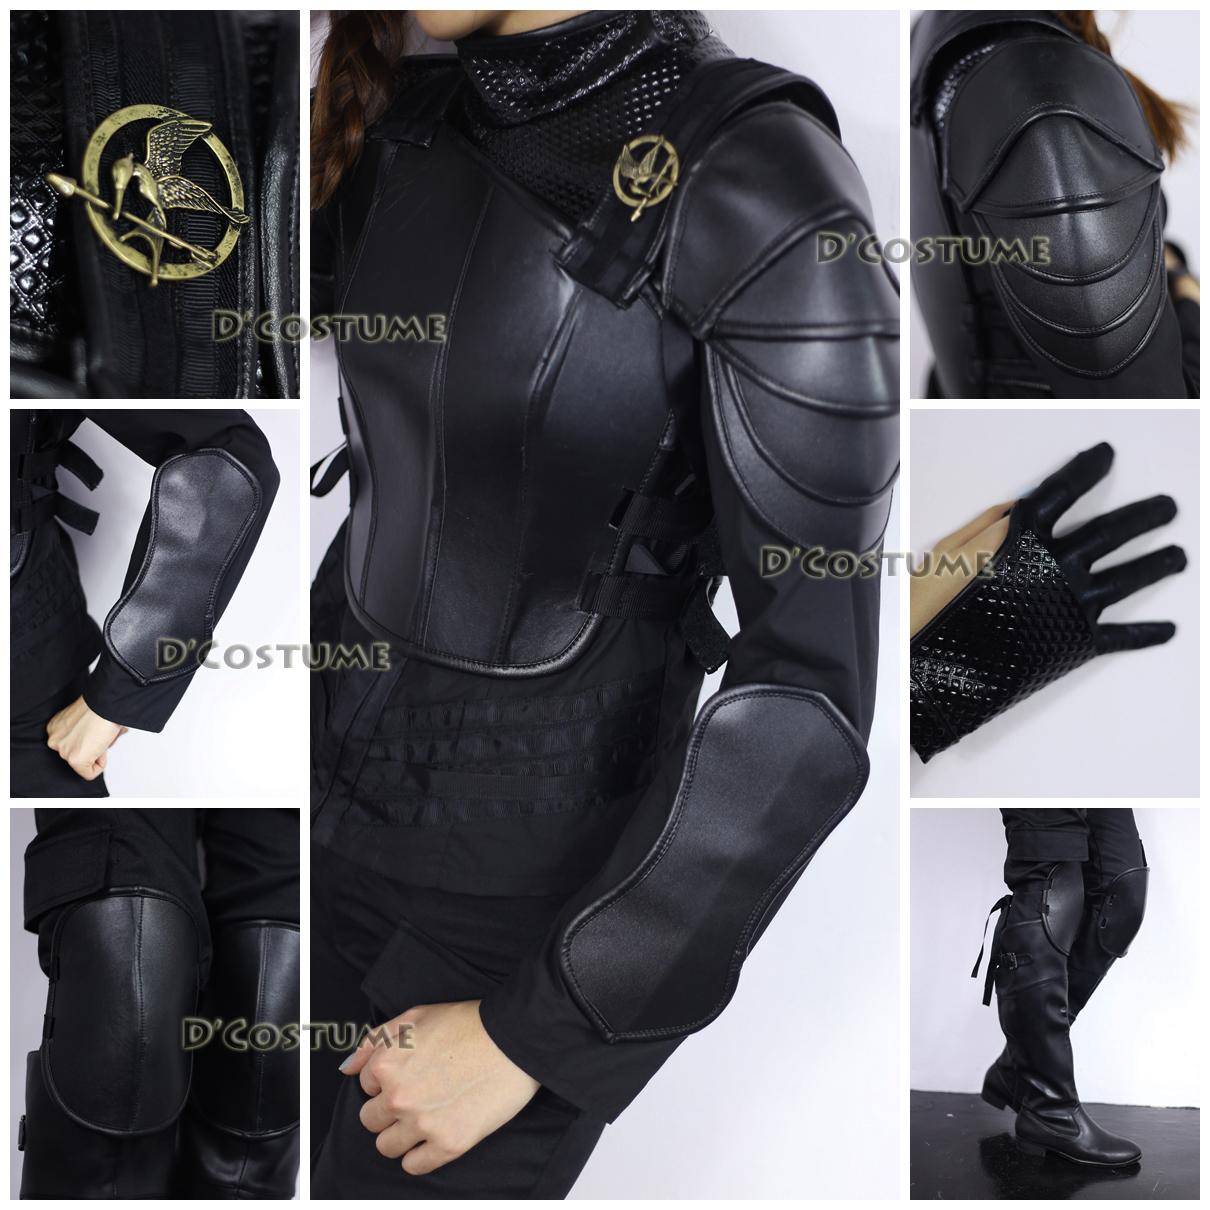 Hunger games costumes katniss